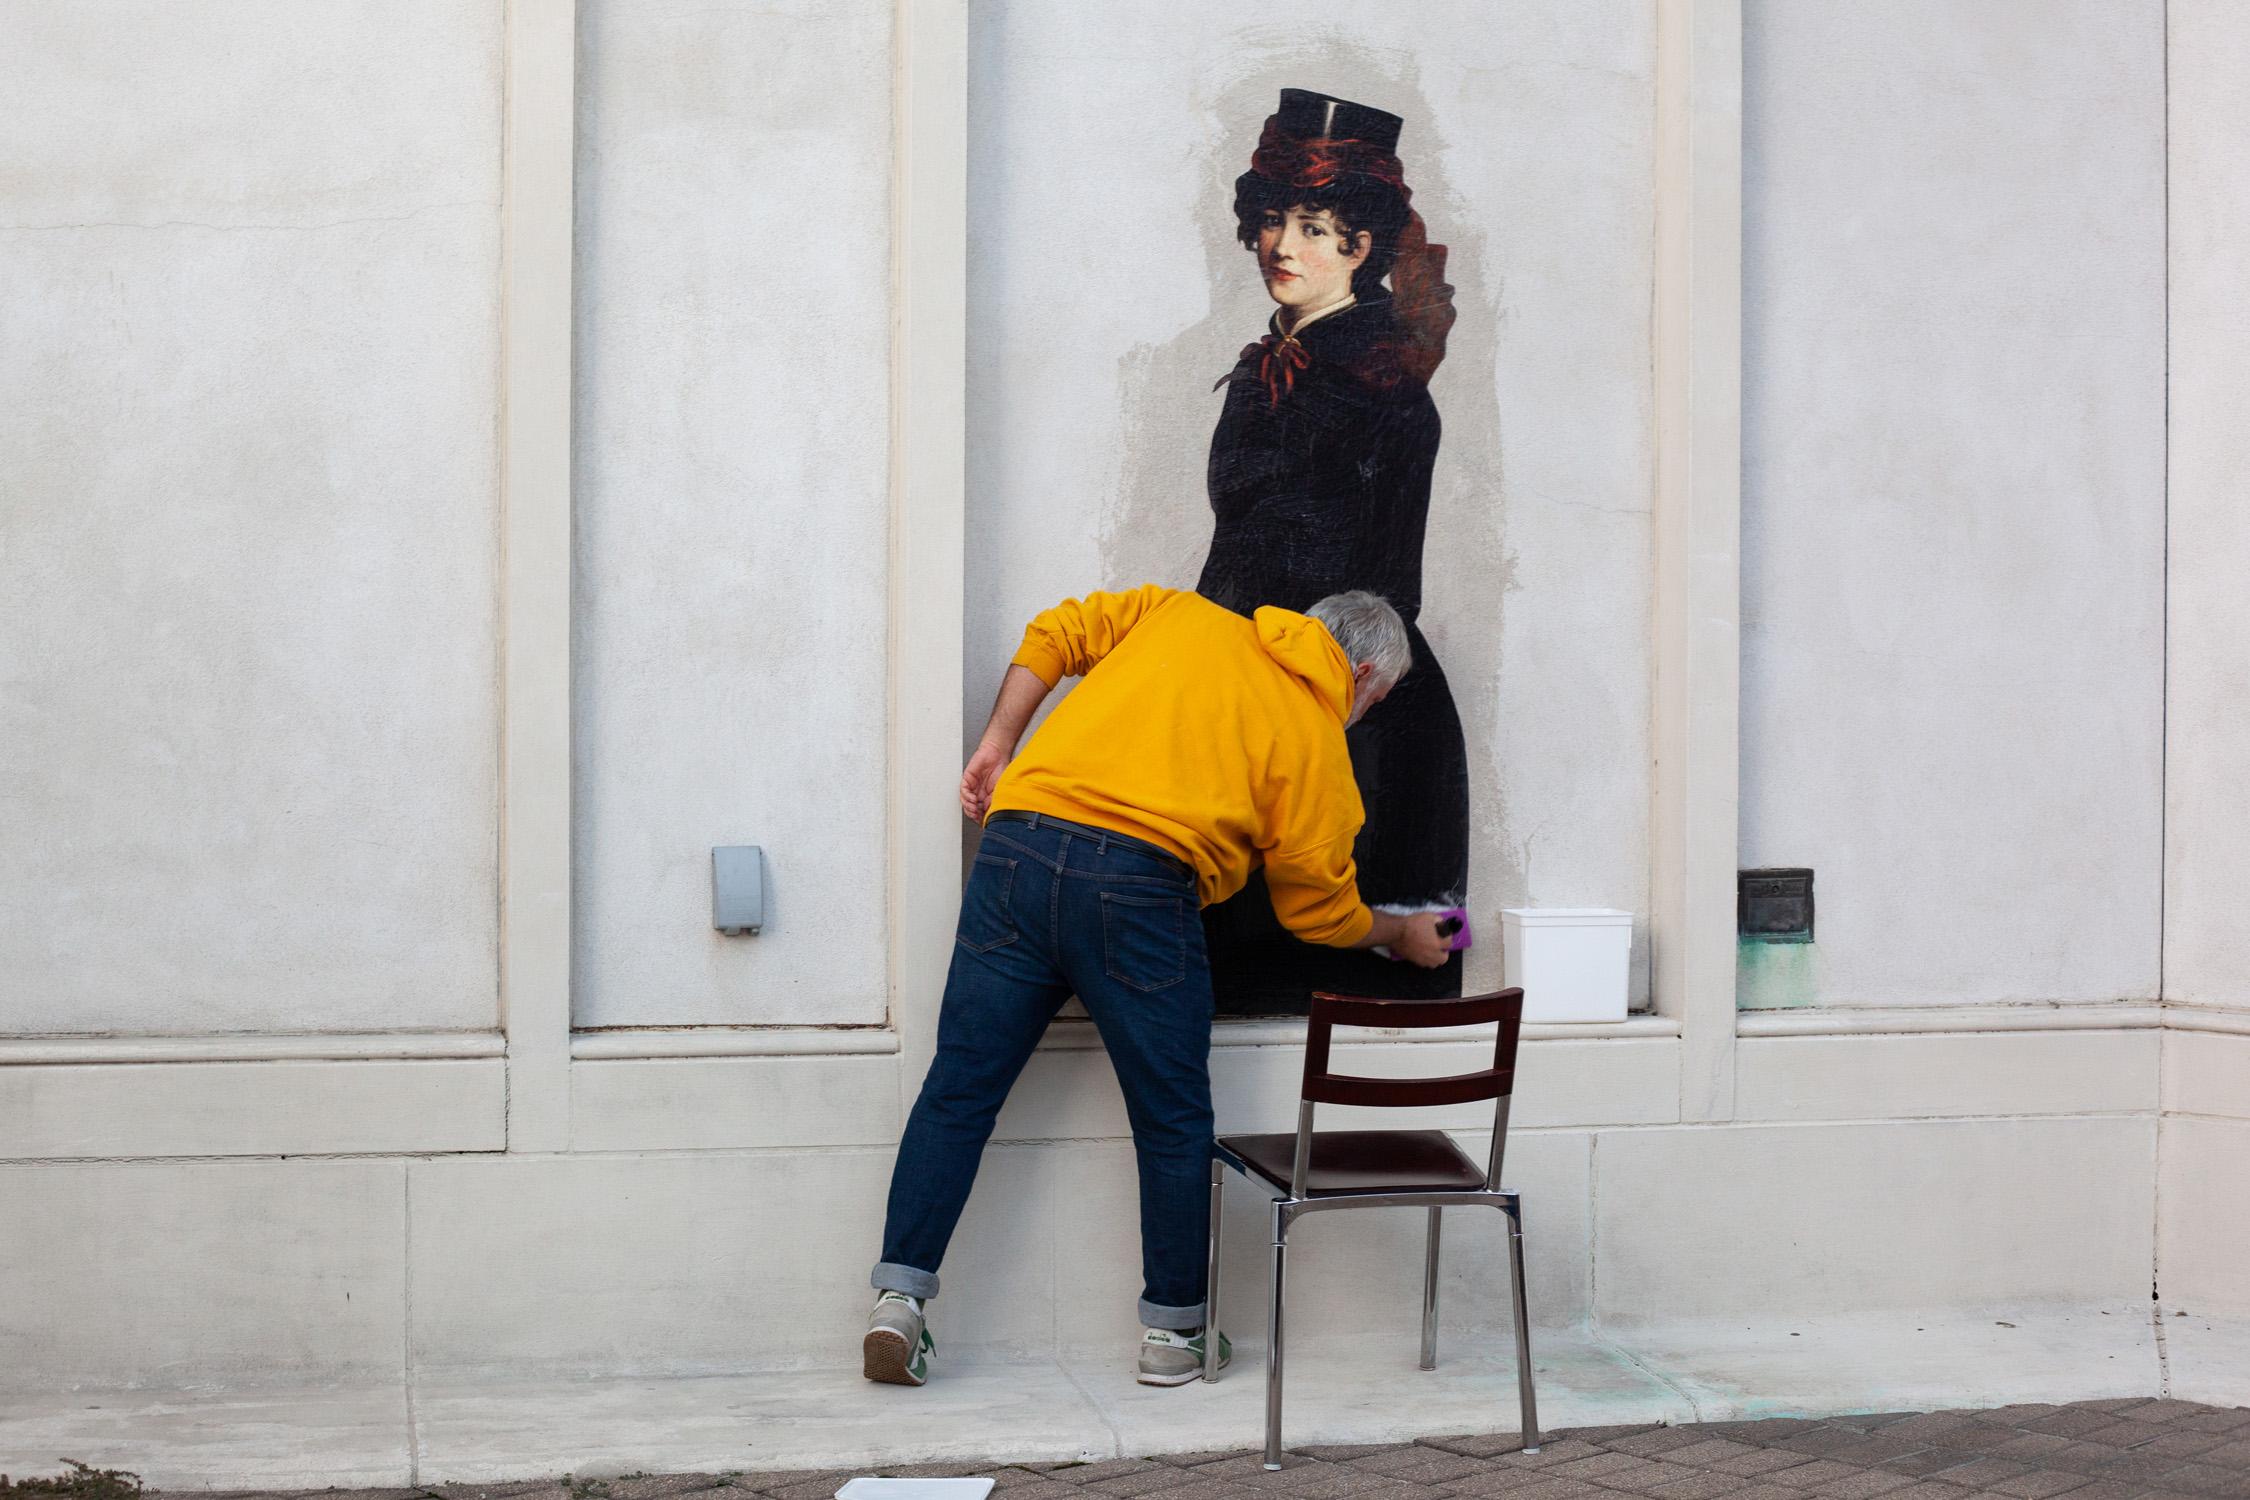 Figure 6. Julien de Casabianca pastes the final character, Memphis artist Kate Carl'sPortraitof Bessie Vance, ca. 1890, onto the façade of the Brooks Museum. Photo courtesy Kathy Dumlao.